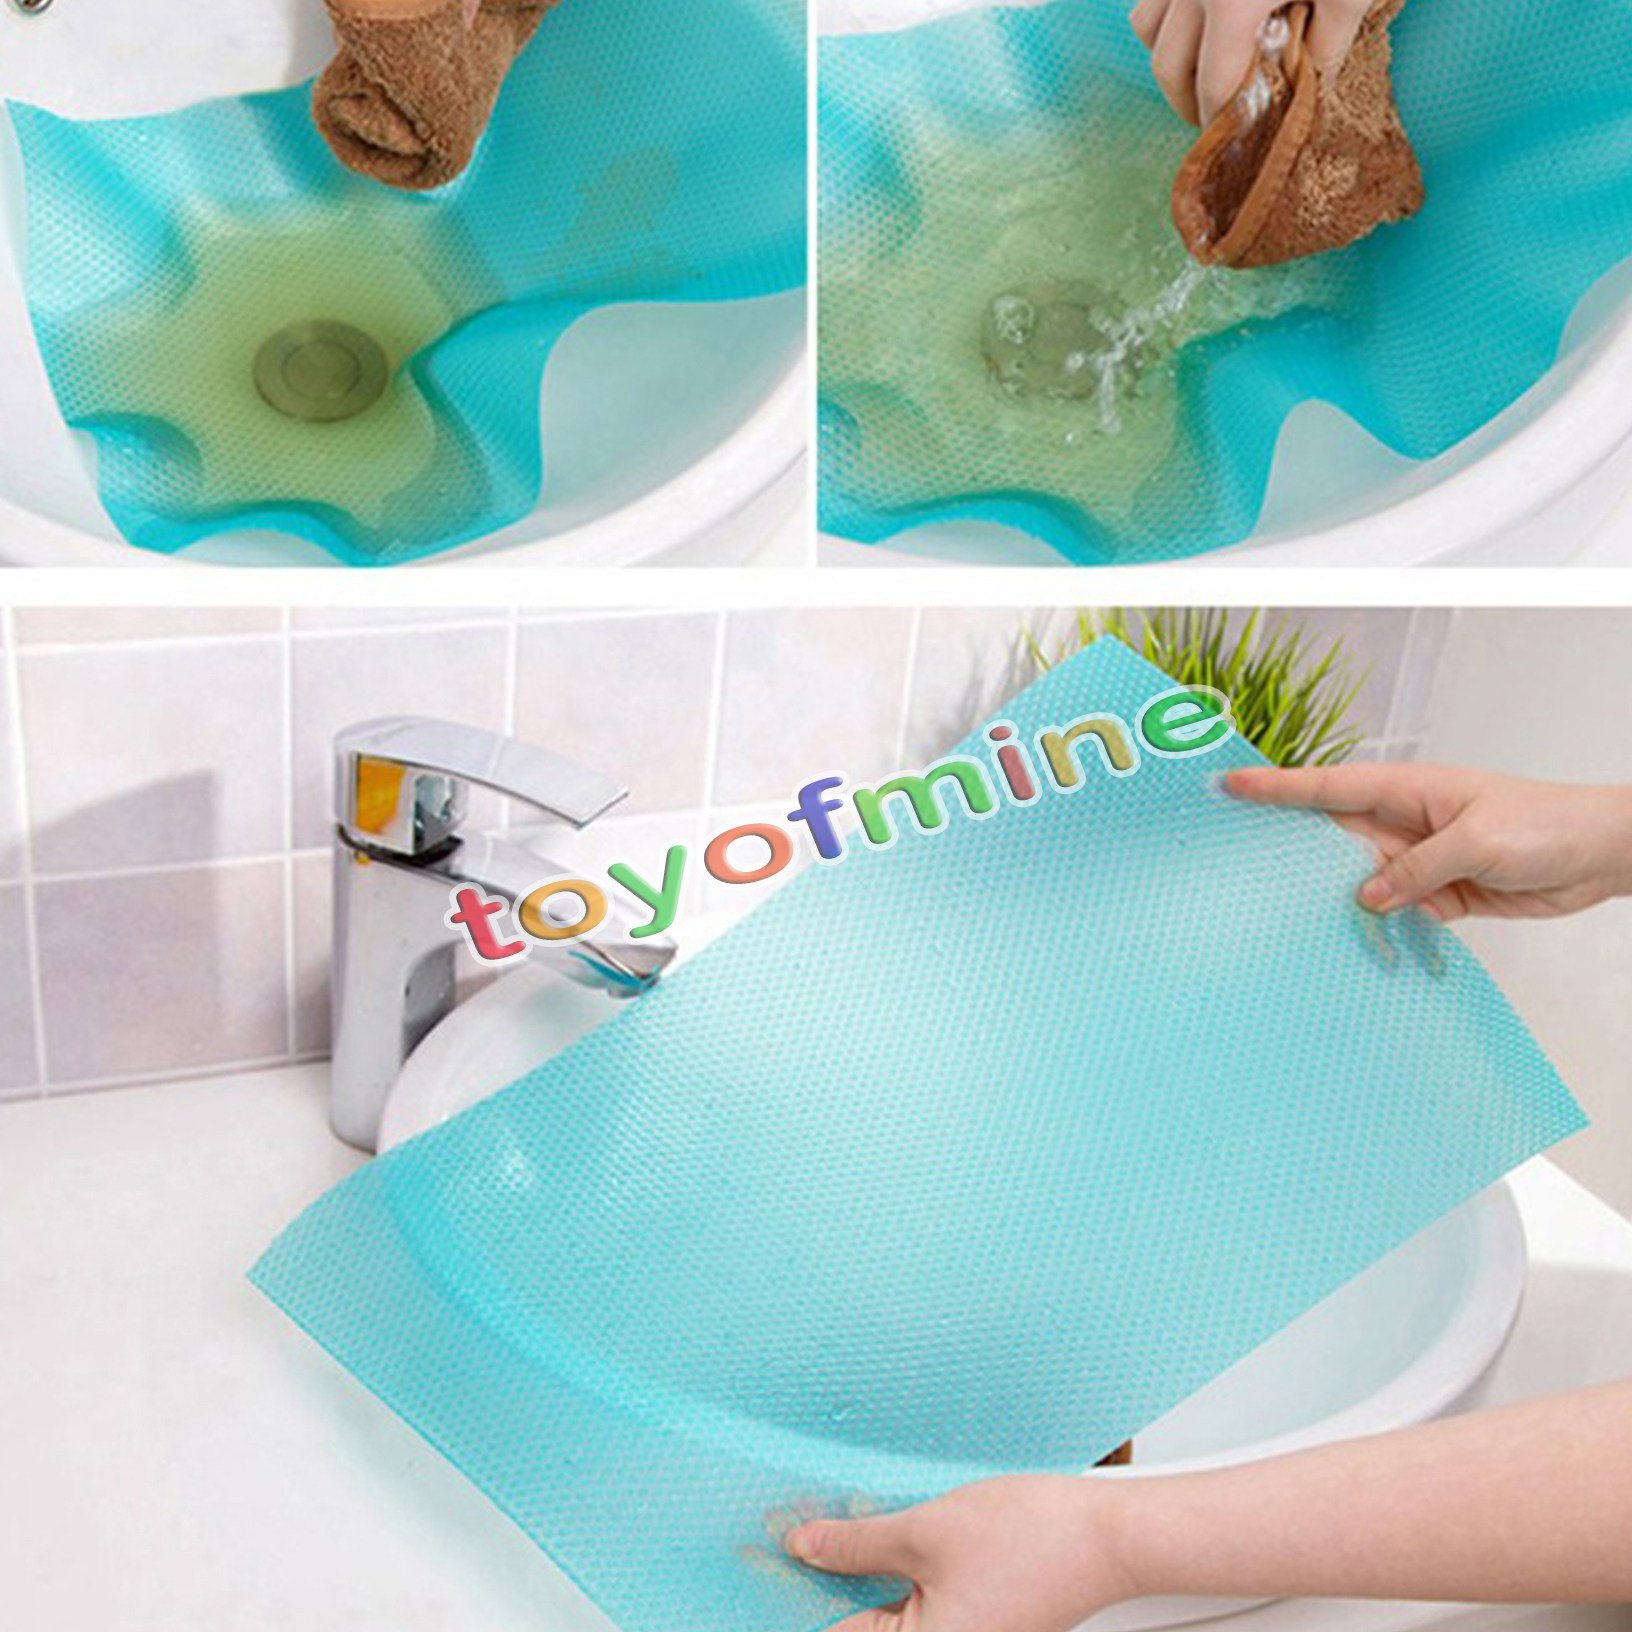 4 x kühlschrank antifouling pad wasserdichte matte ~ Kühlschrank Nass